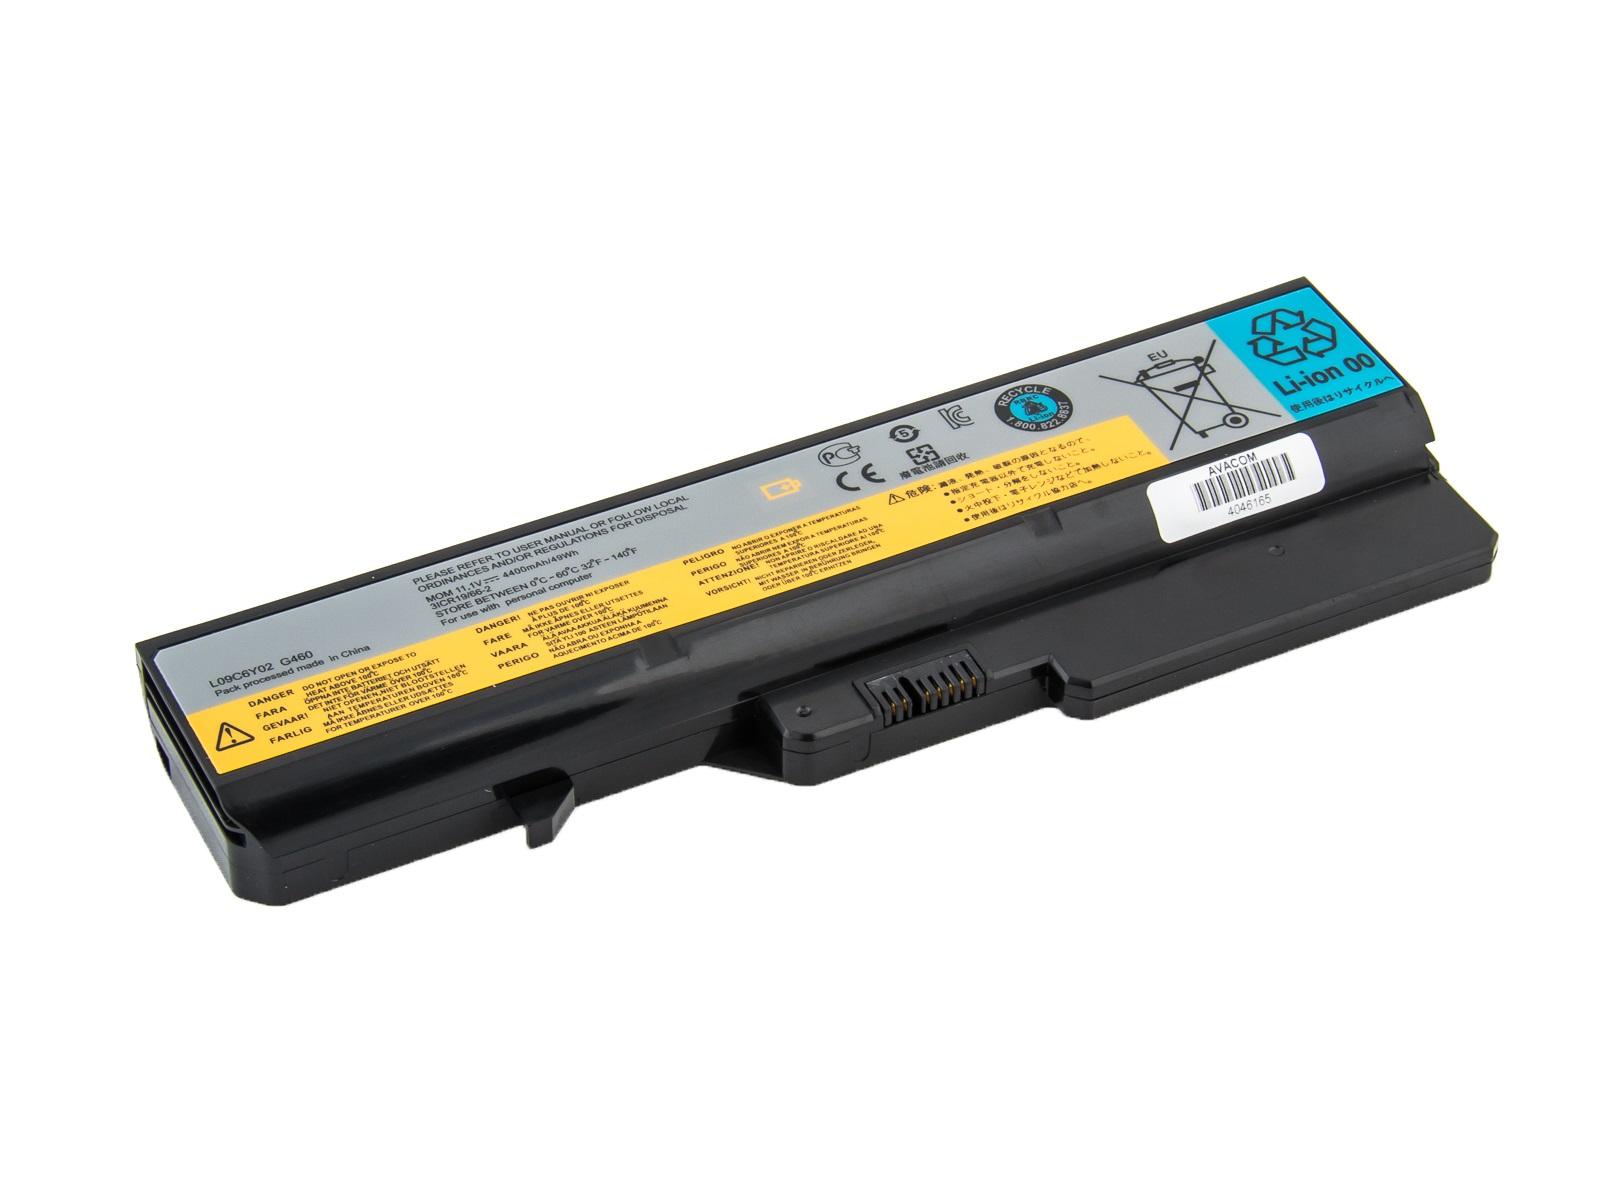 Baterie AVACOM NOLE-G560-N22 pro Lenovo G560, IdeaPad V470 series Li-Ion 10,8V 4400mAh, NOLE-G560-N2